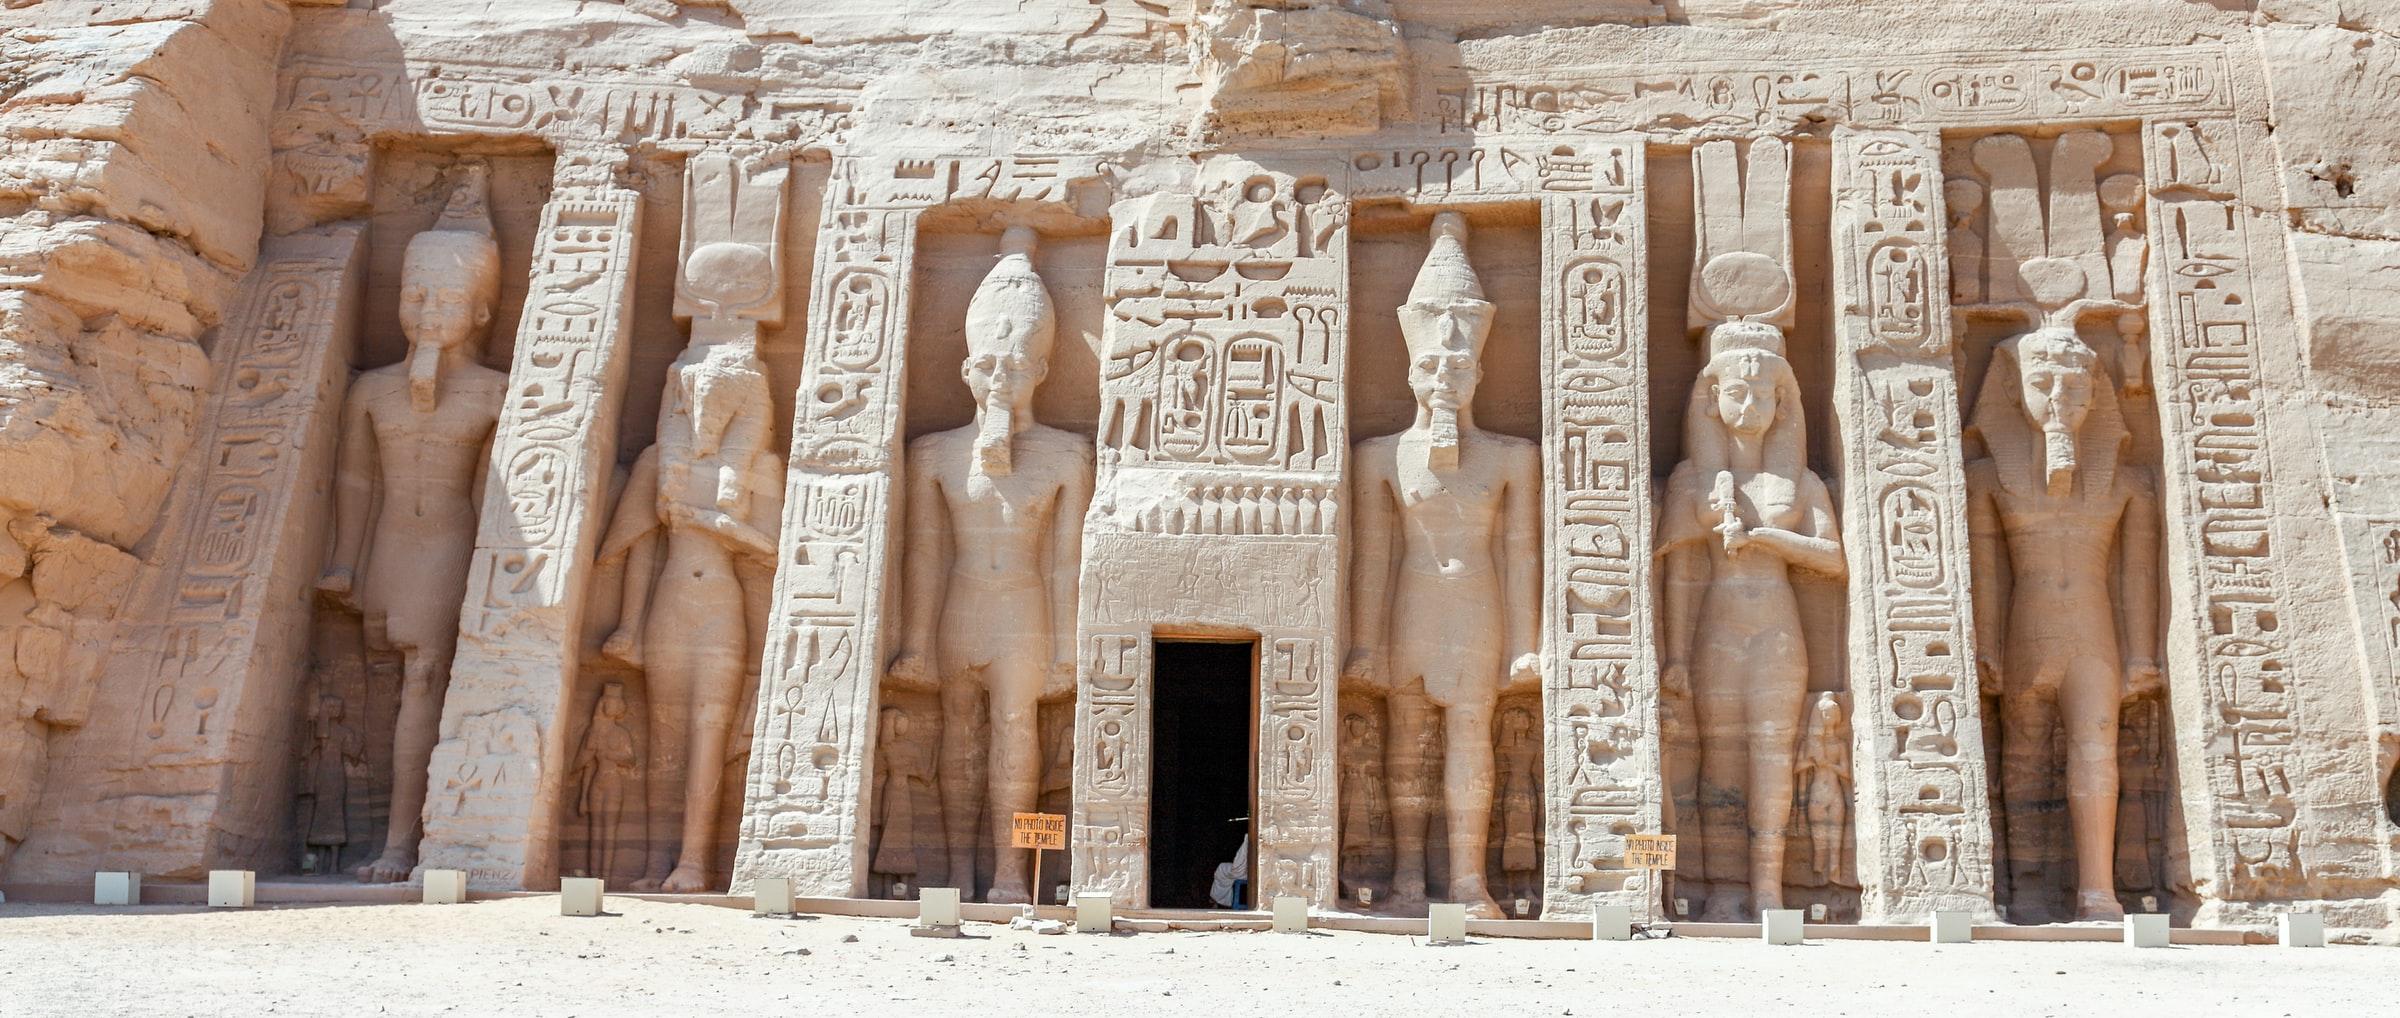 De tempels van Abu Simbel in Egypte